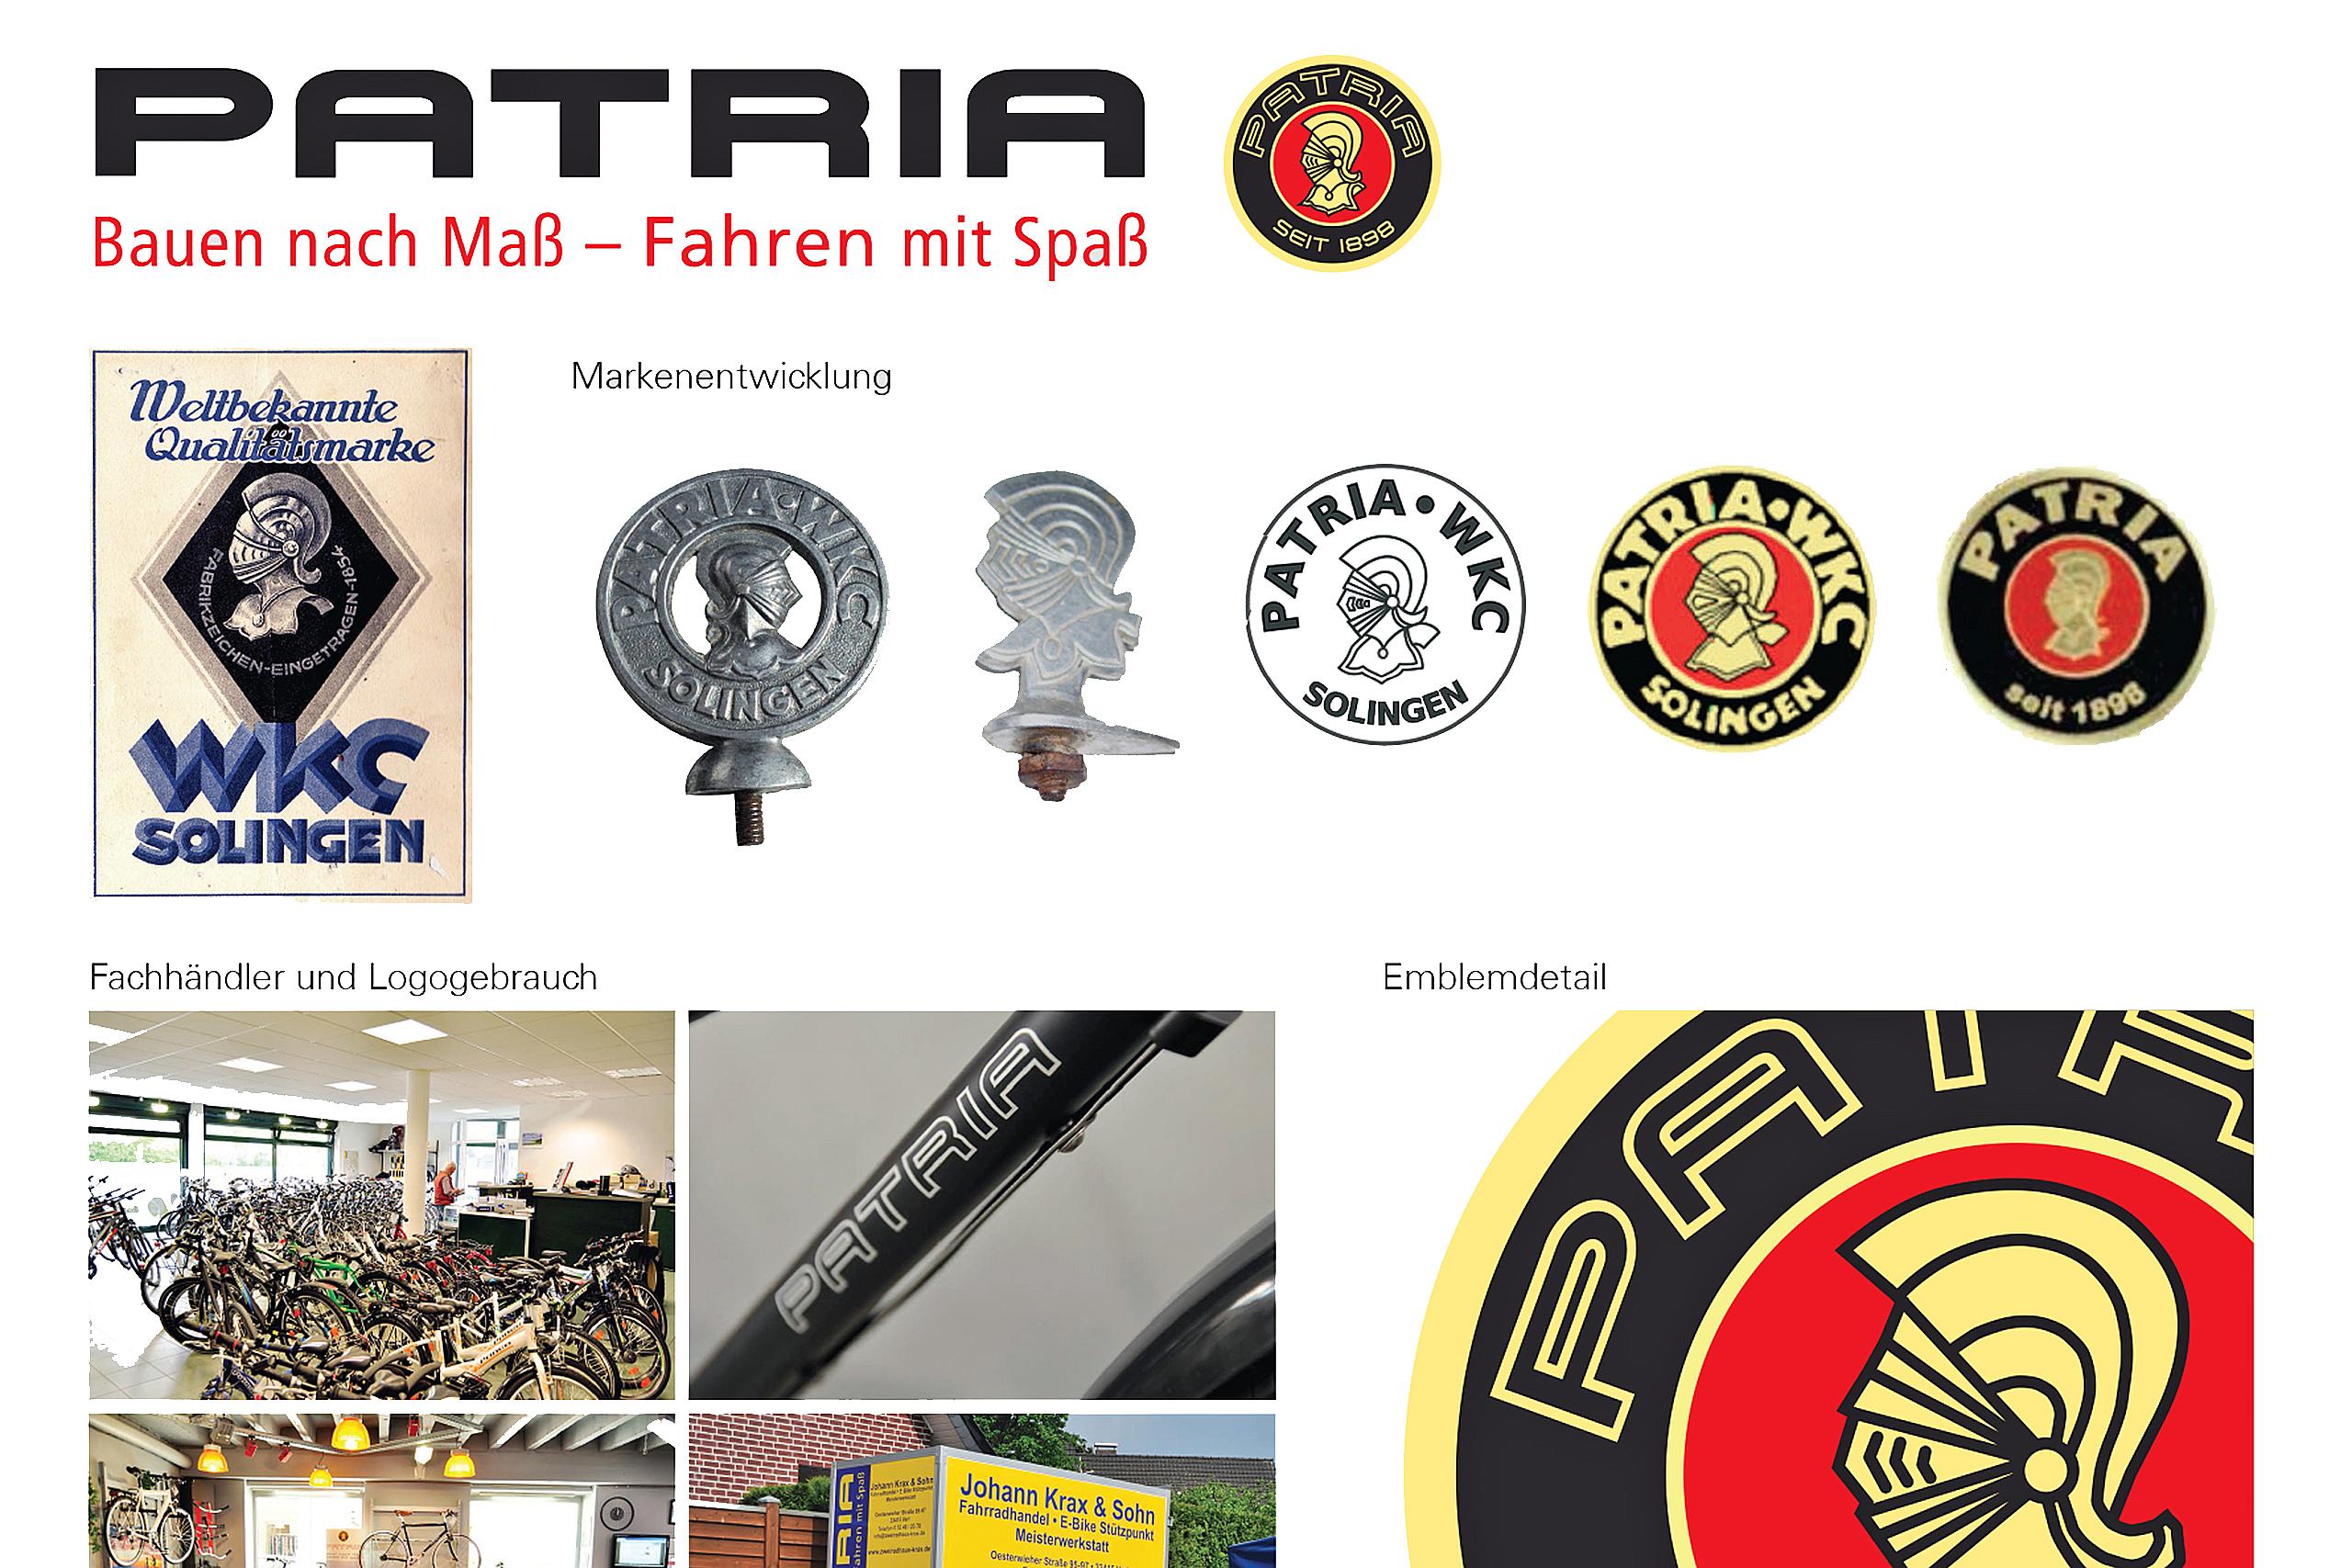 Patria Redesign (old CI and CD) – Birte Franz (BA)   Photos and Illustrations: Birte Franz